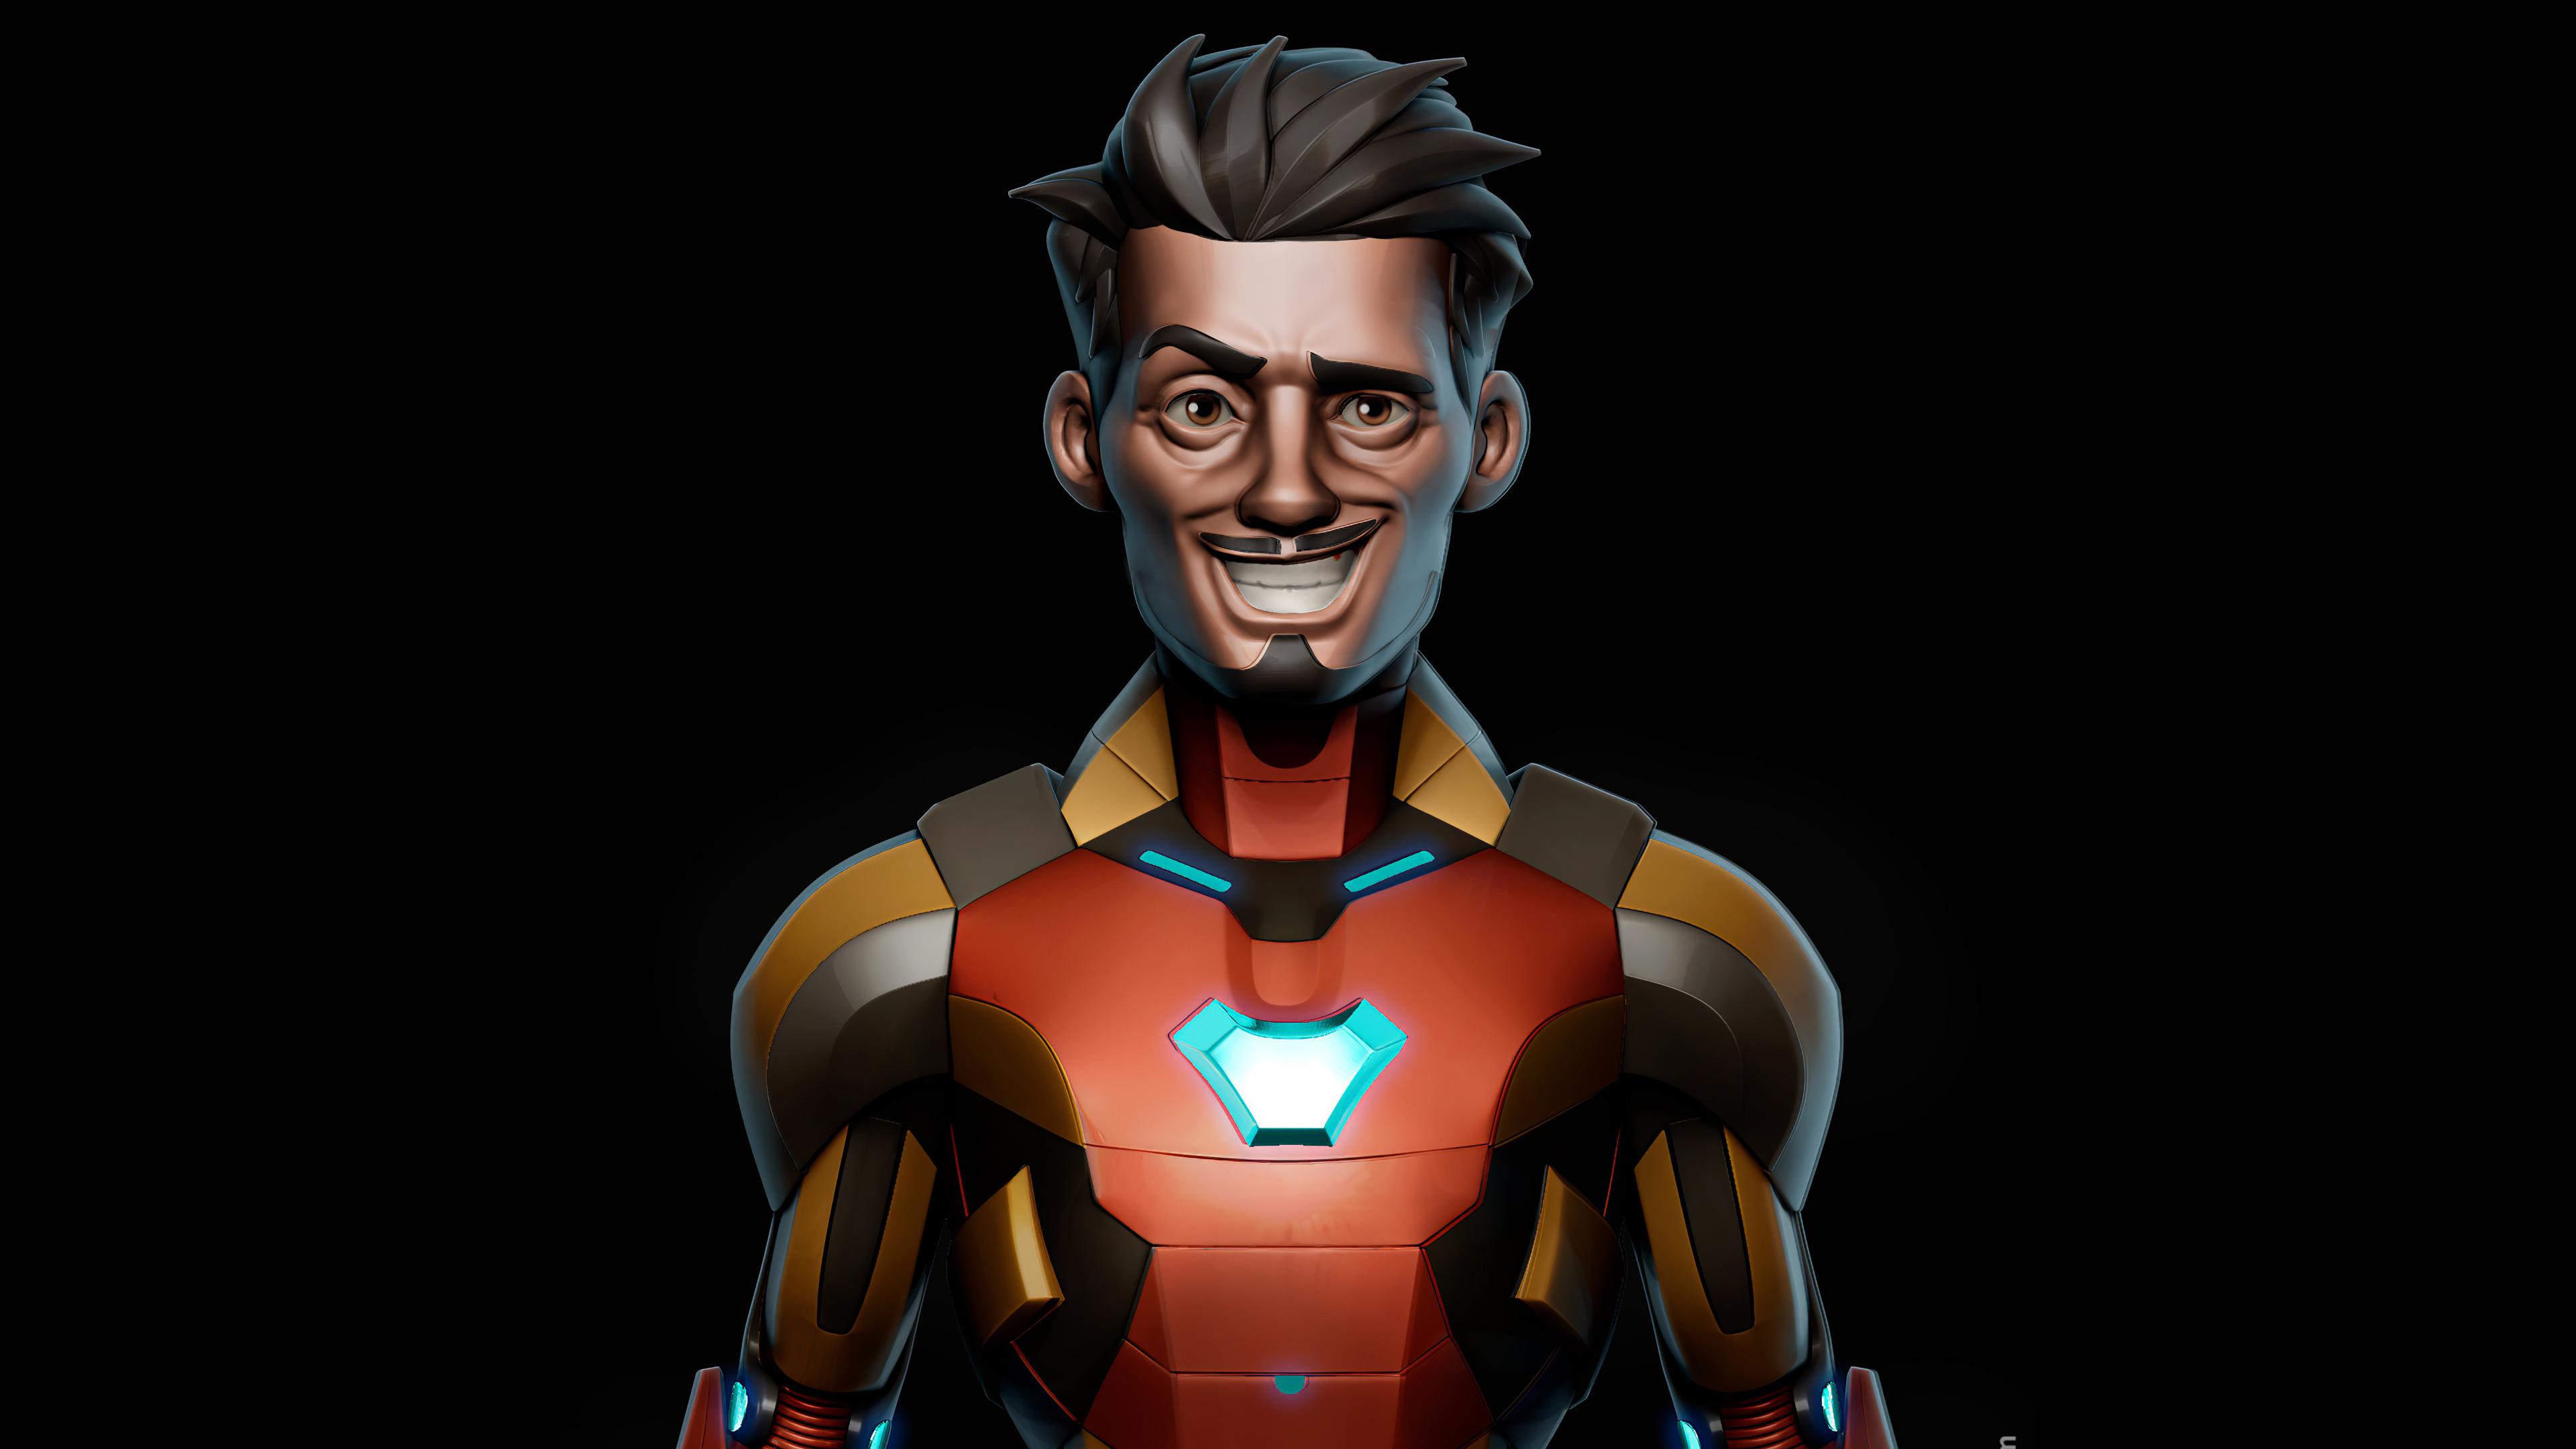 Fondos de pantalla Fanart Iron Man sonriendo